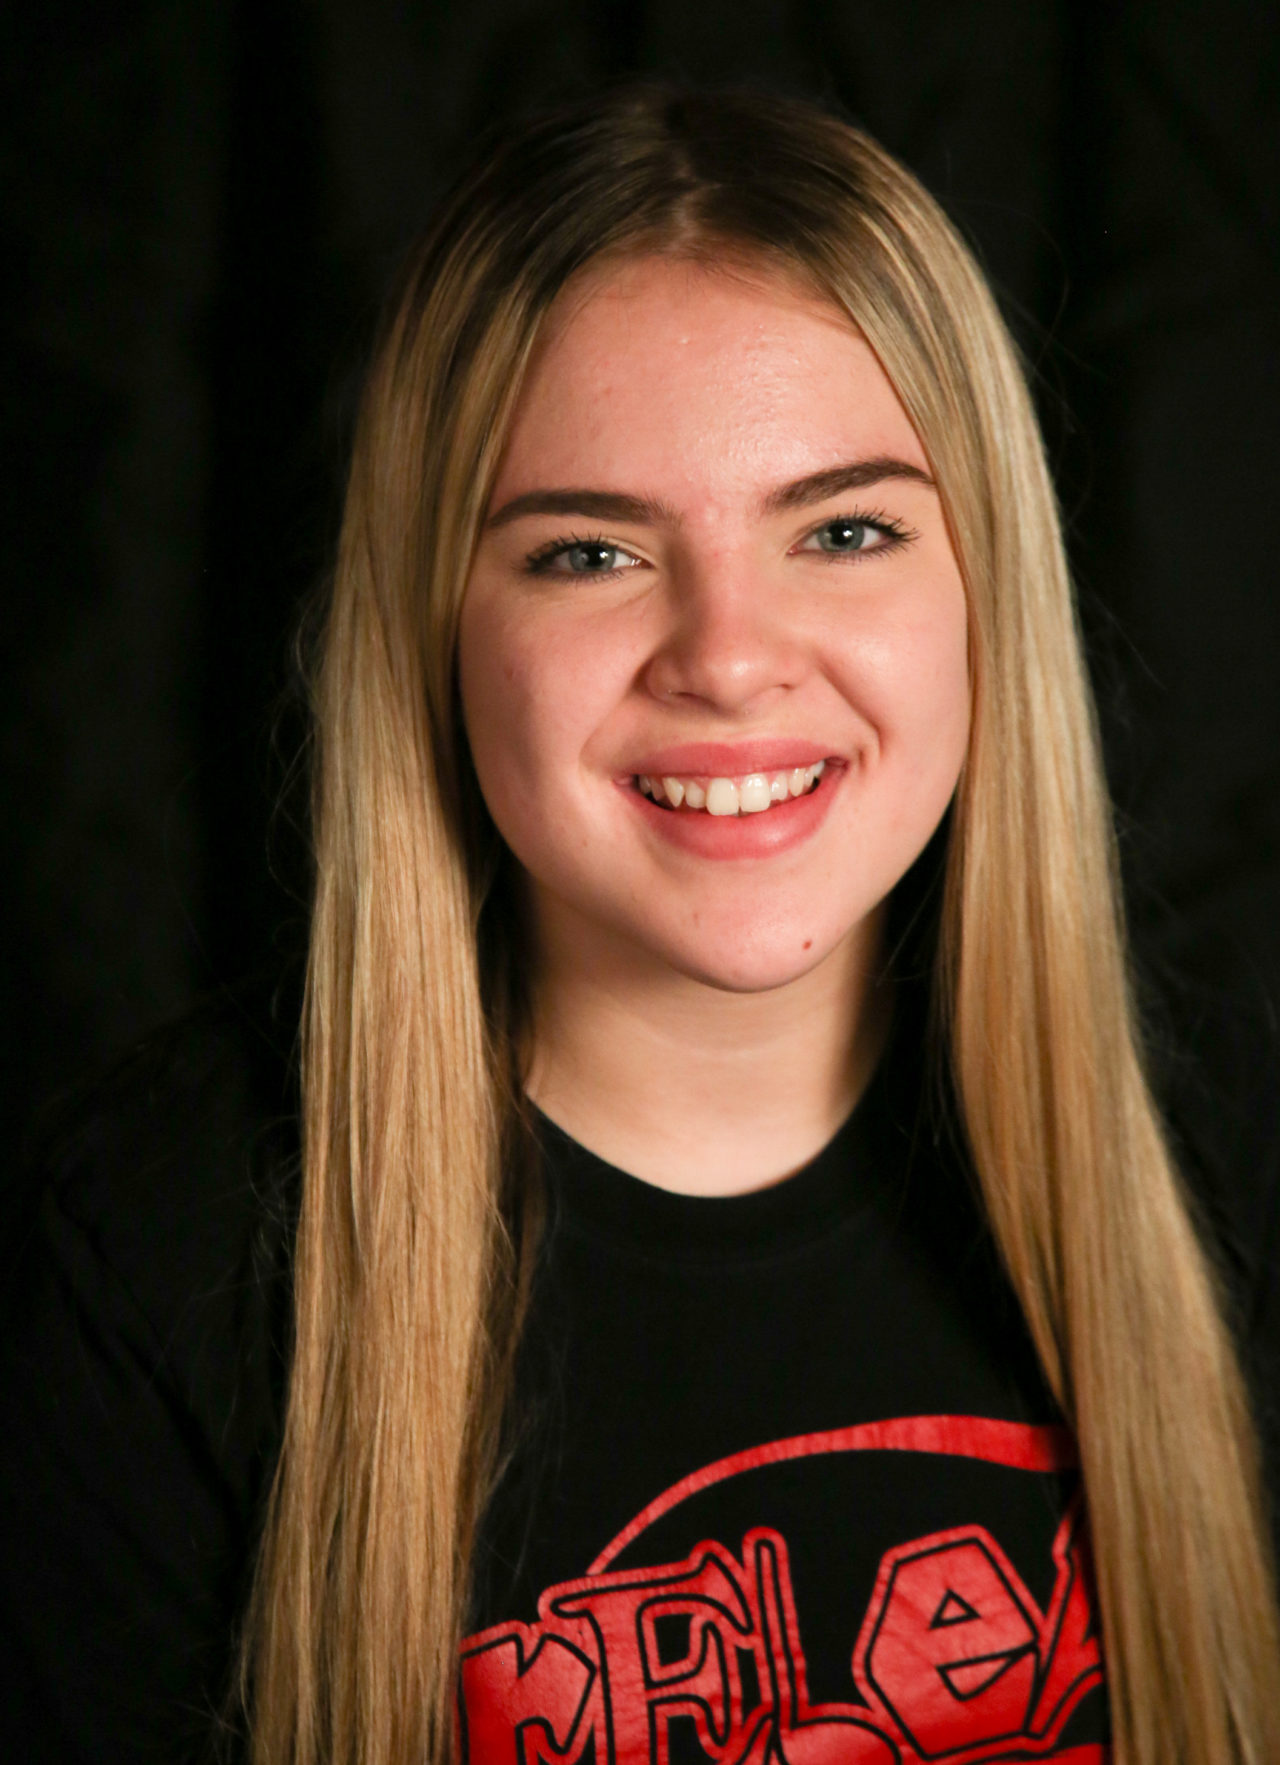 Lizzie-Beth Woodland